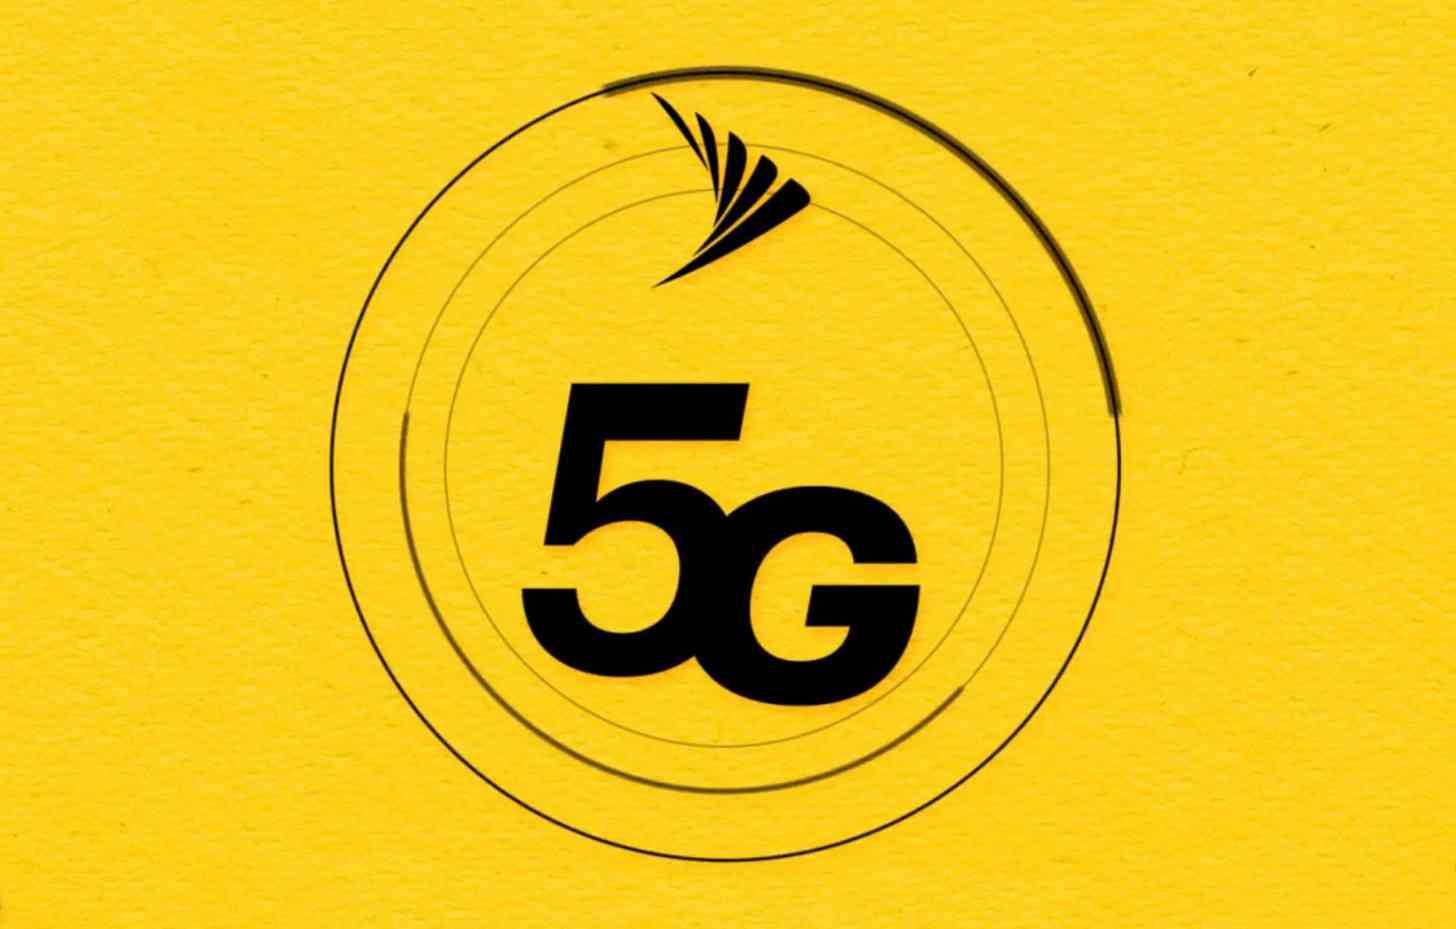 Sprint推出5G网络 称它具有最大的初始5G覆盖范围